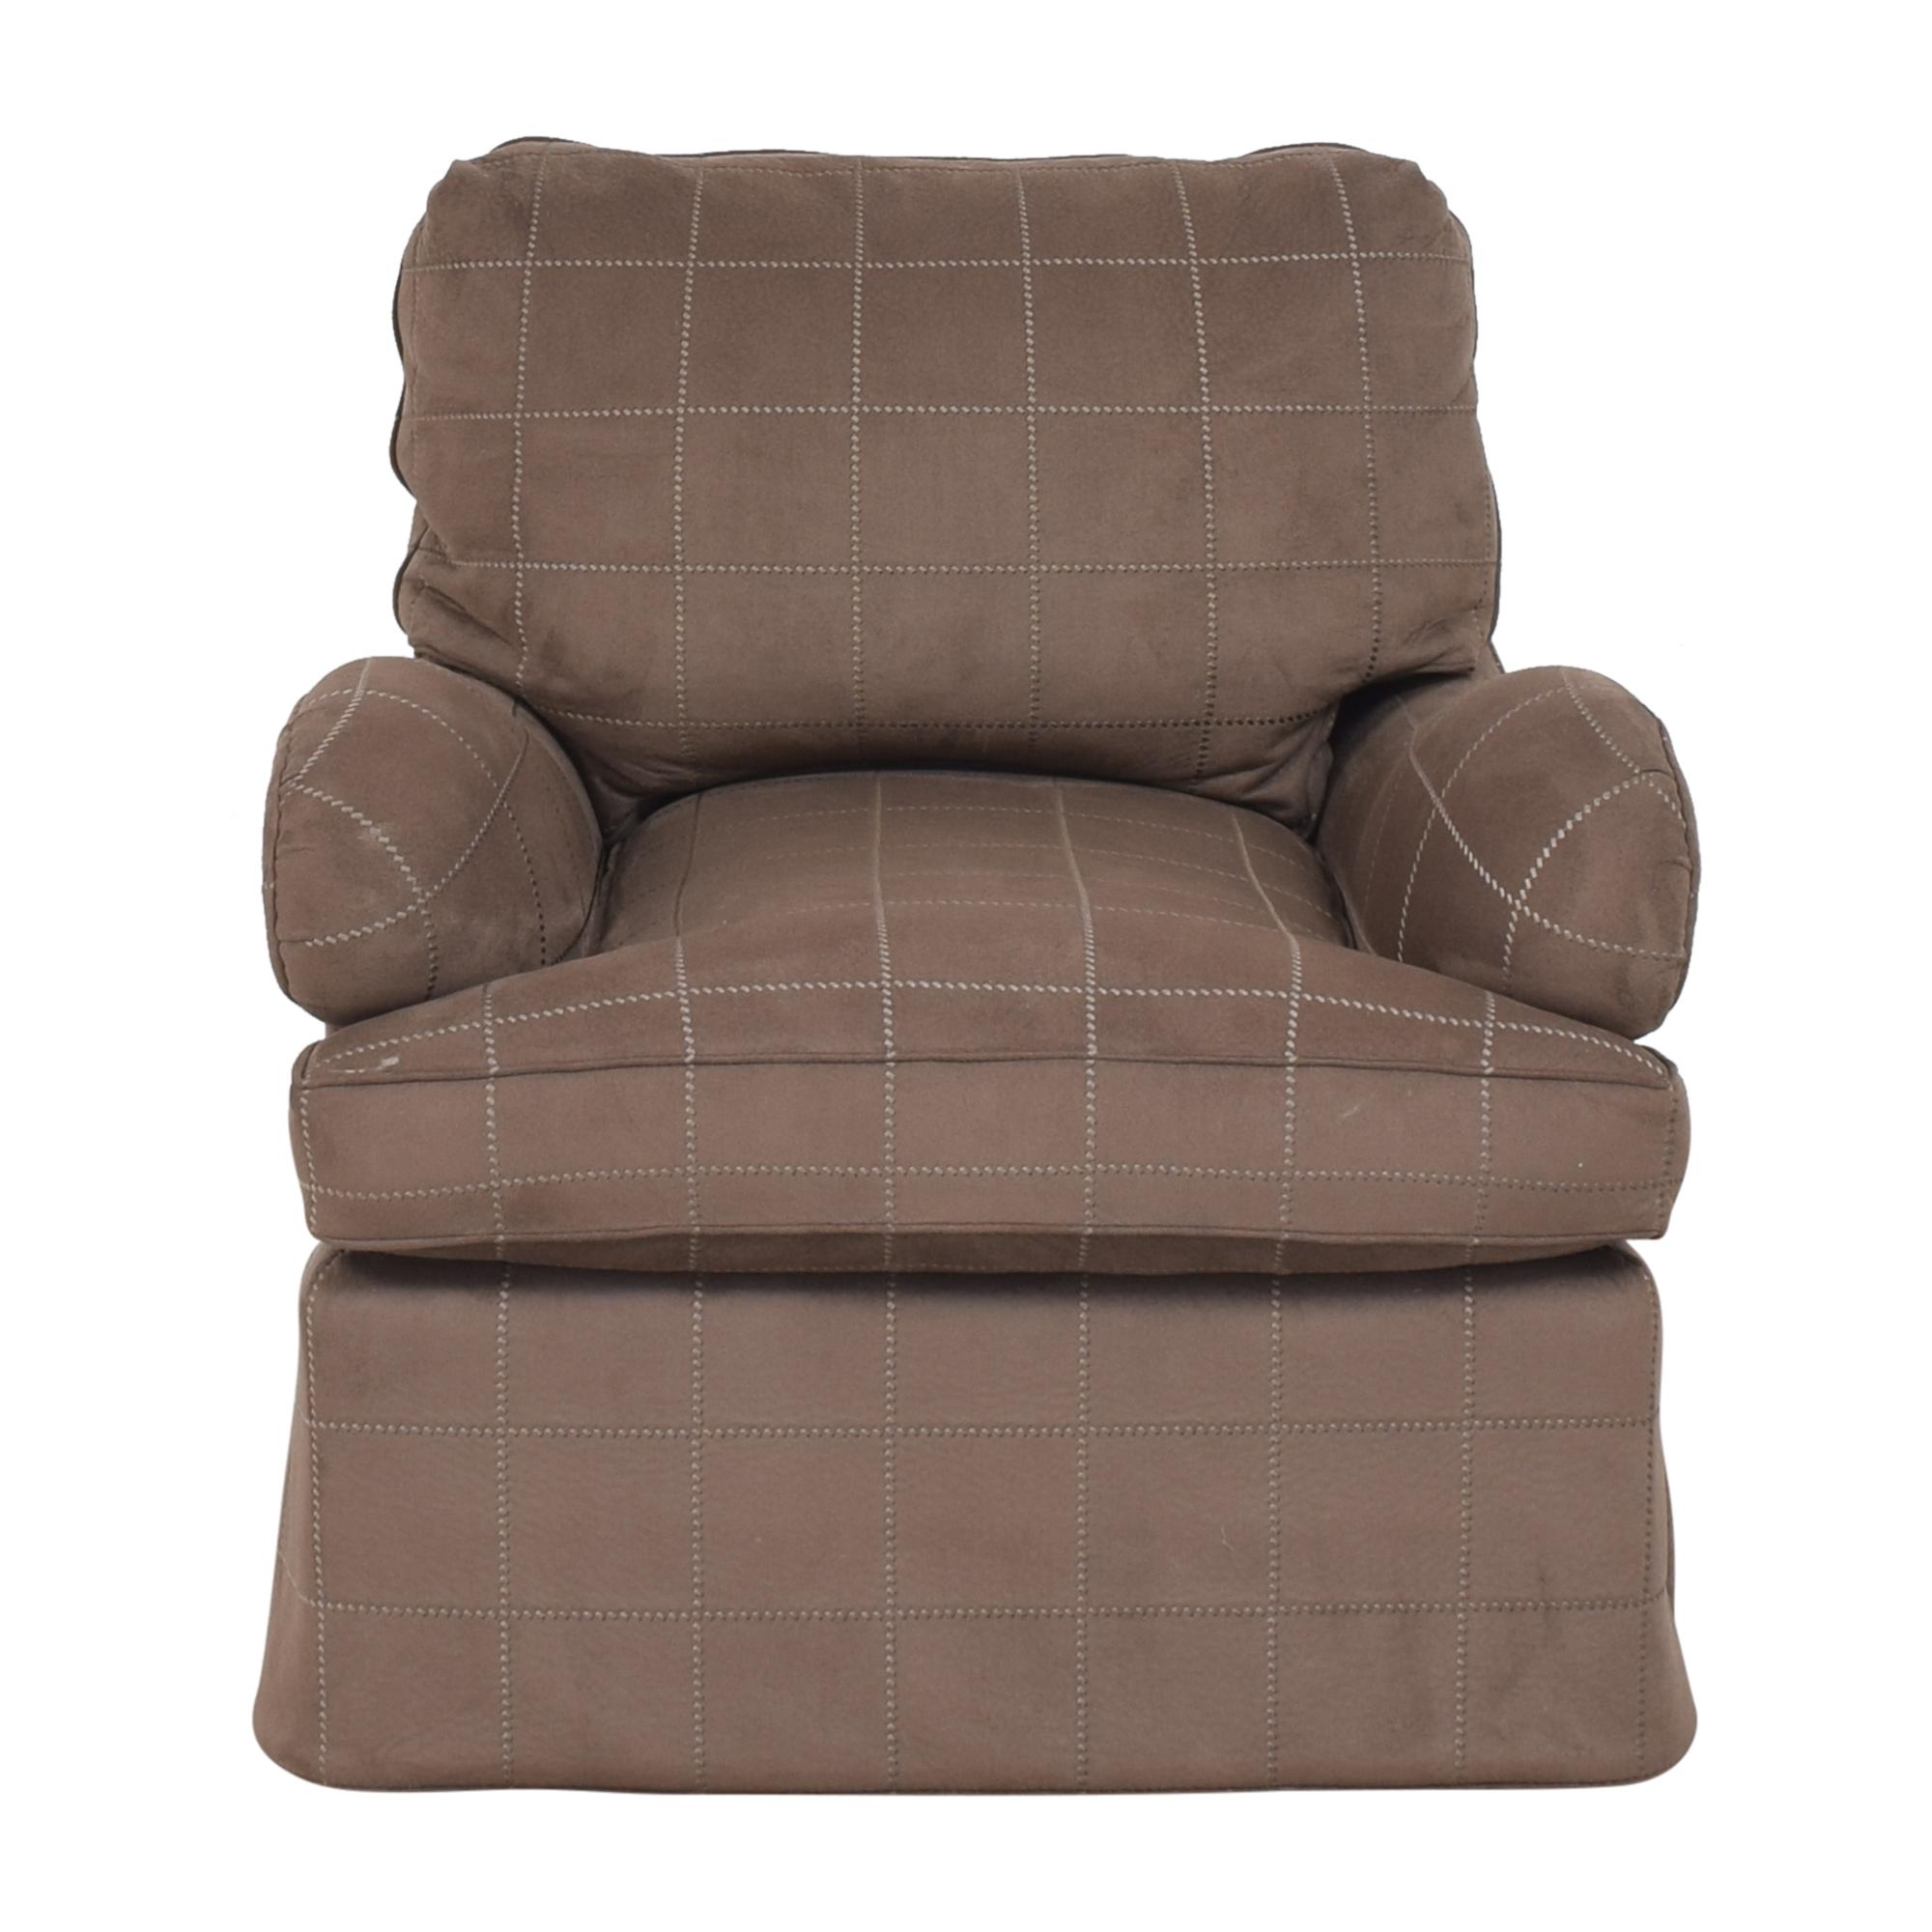 shop Dessin Fournir Collections Lancaster Club Chair Dessin Fournir Accent Chairs